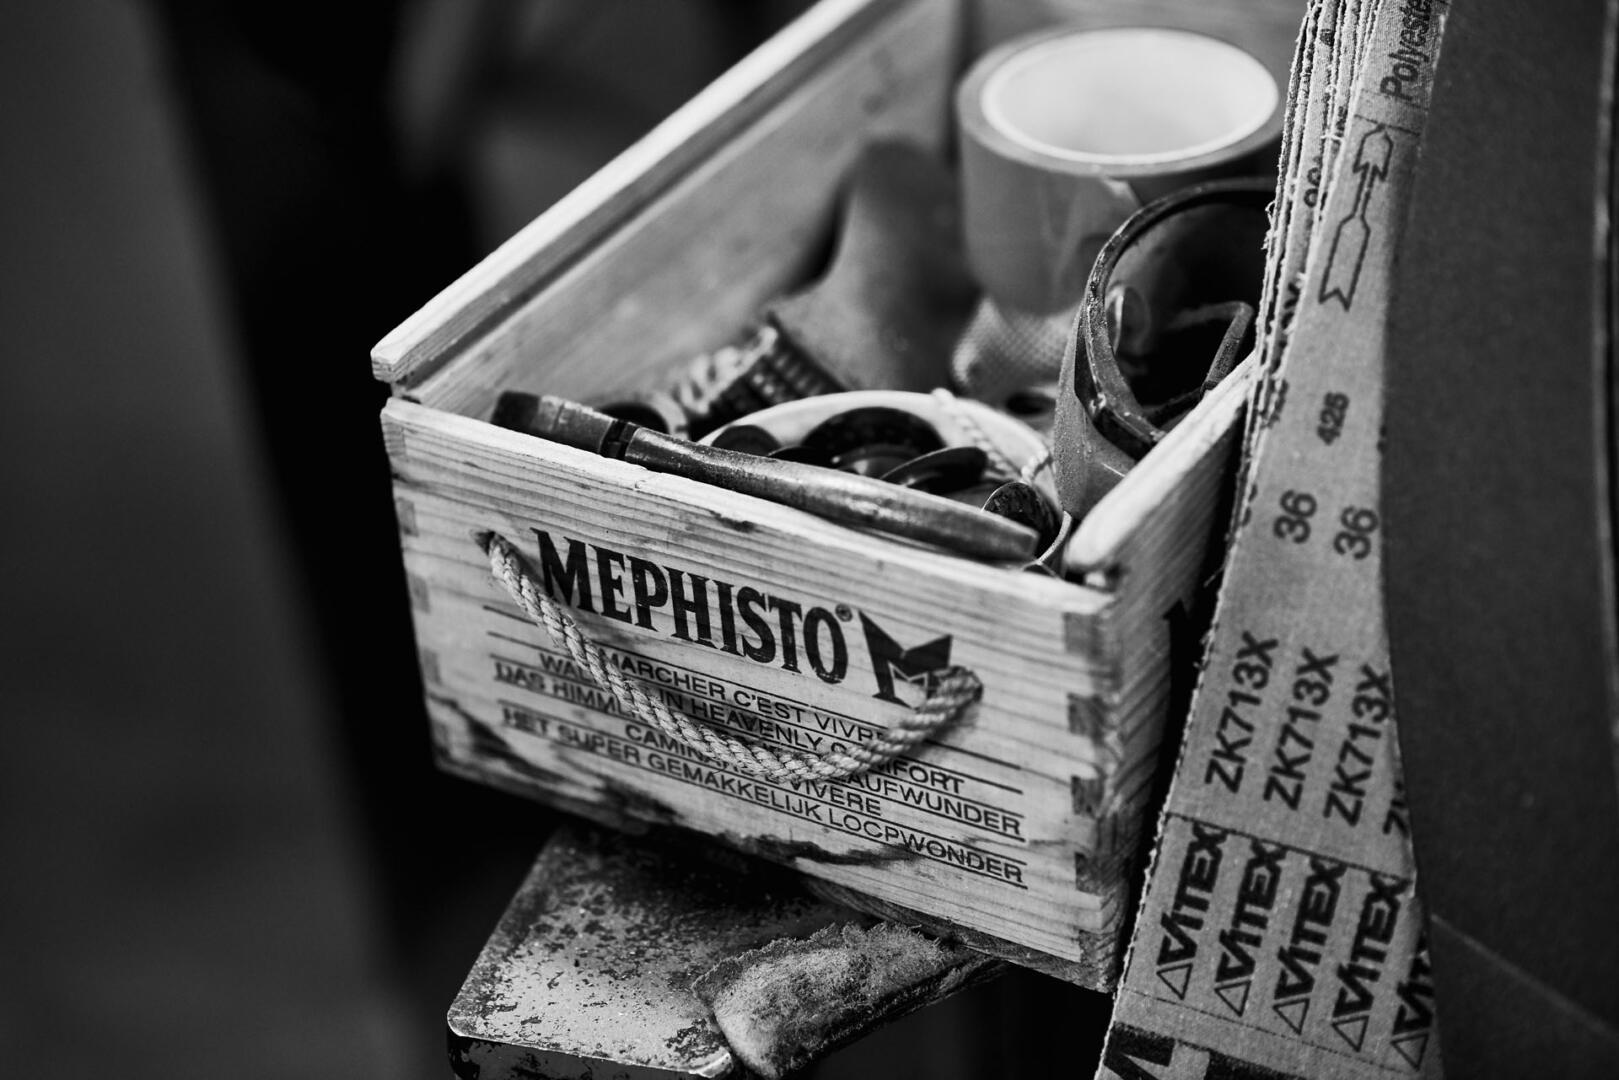 Mephisto Originals 16